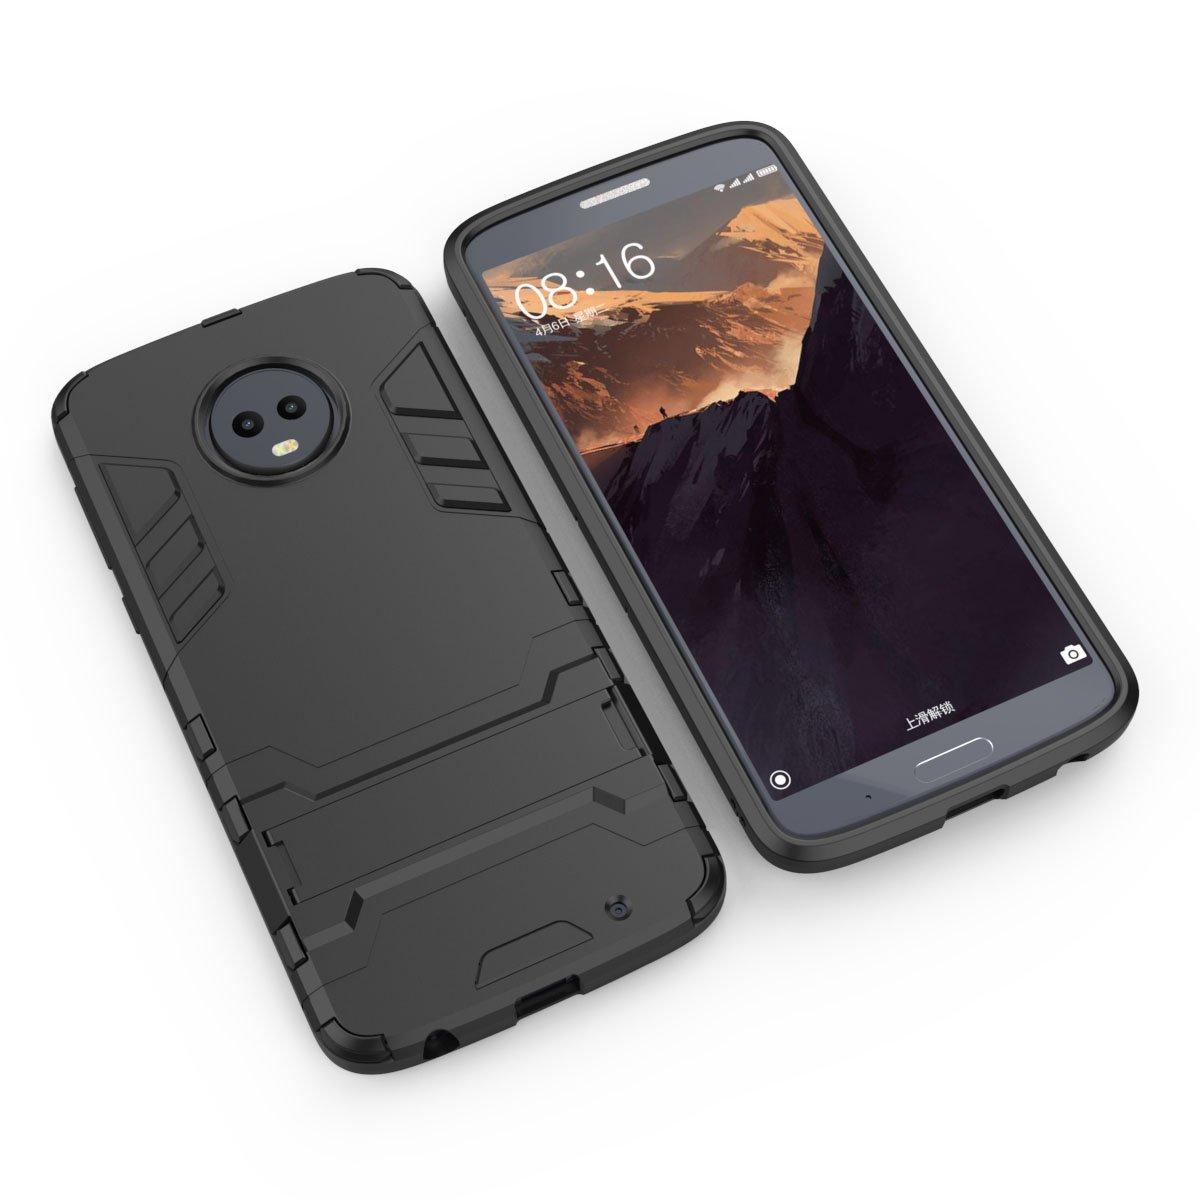 Amazon.com: Moto G6 Plus funda, Moto G6 Plus carcasa híbrida ...